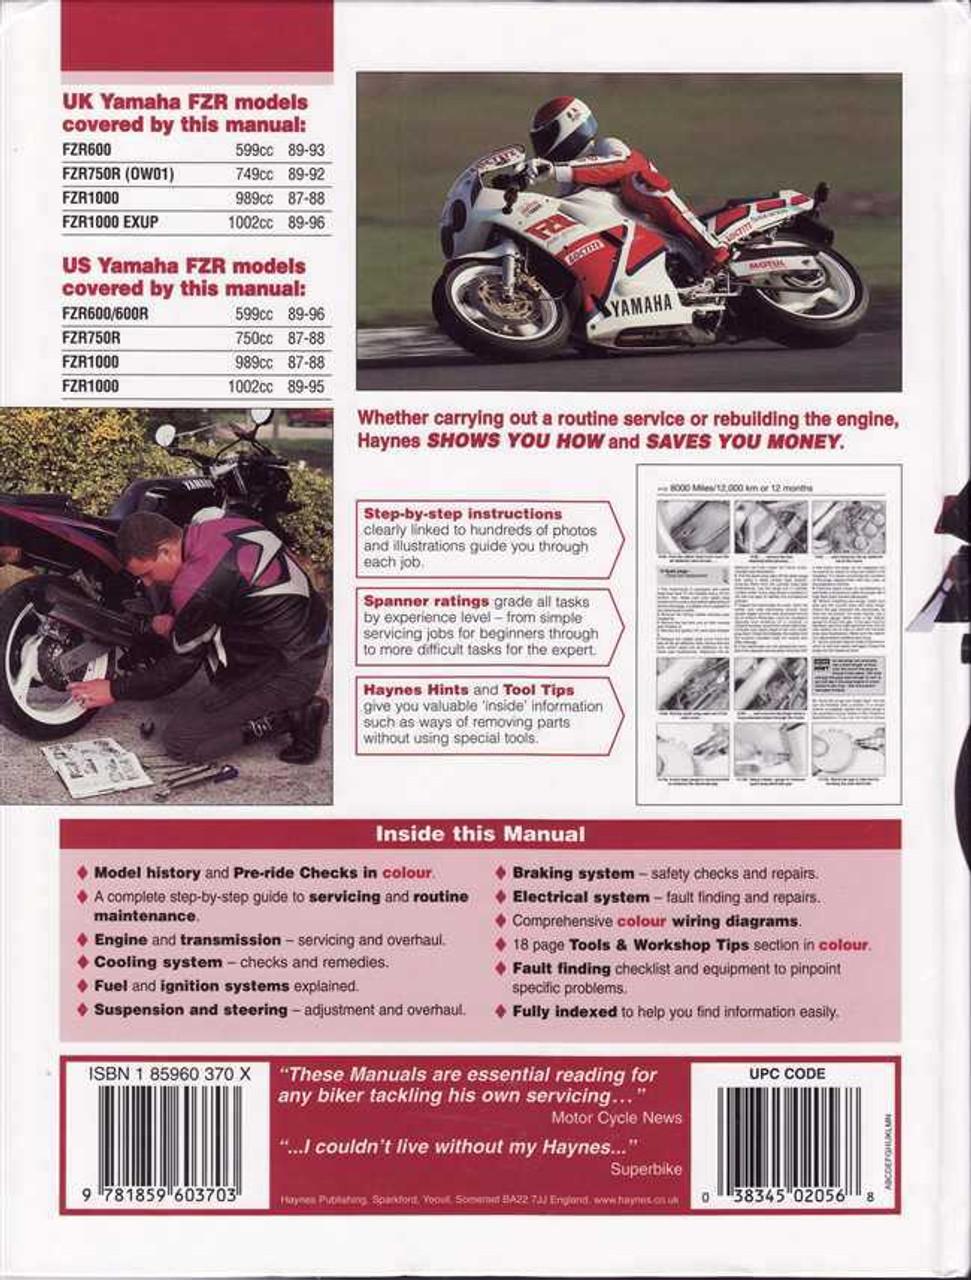 gmc fuse box diagrams, sincgars radio configurations diagrams, honda  motorcycle repair diagrams, pinout